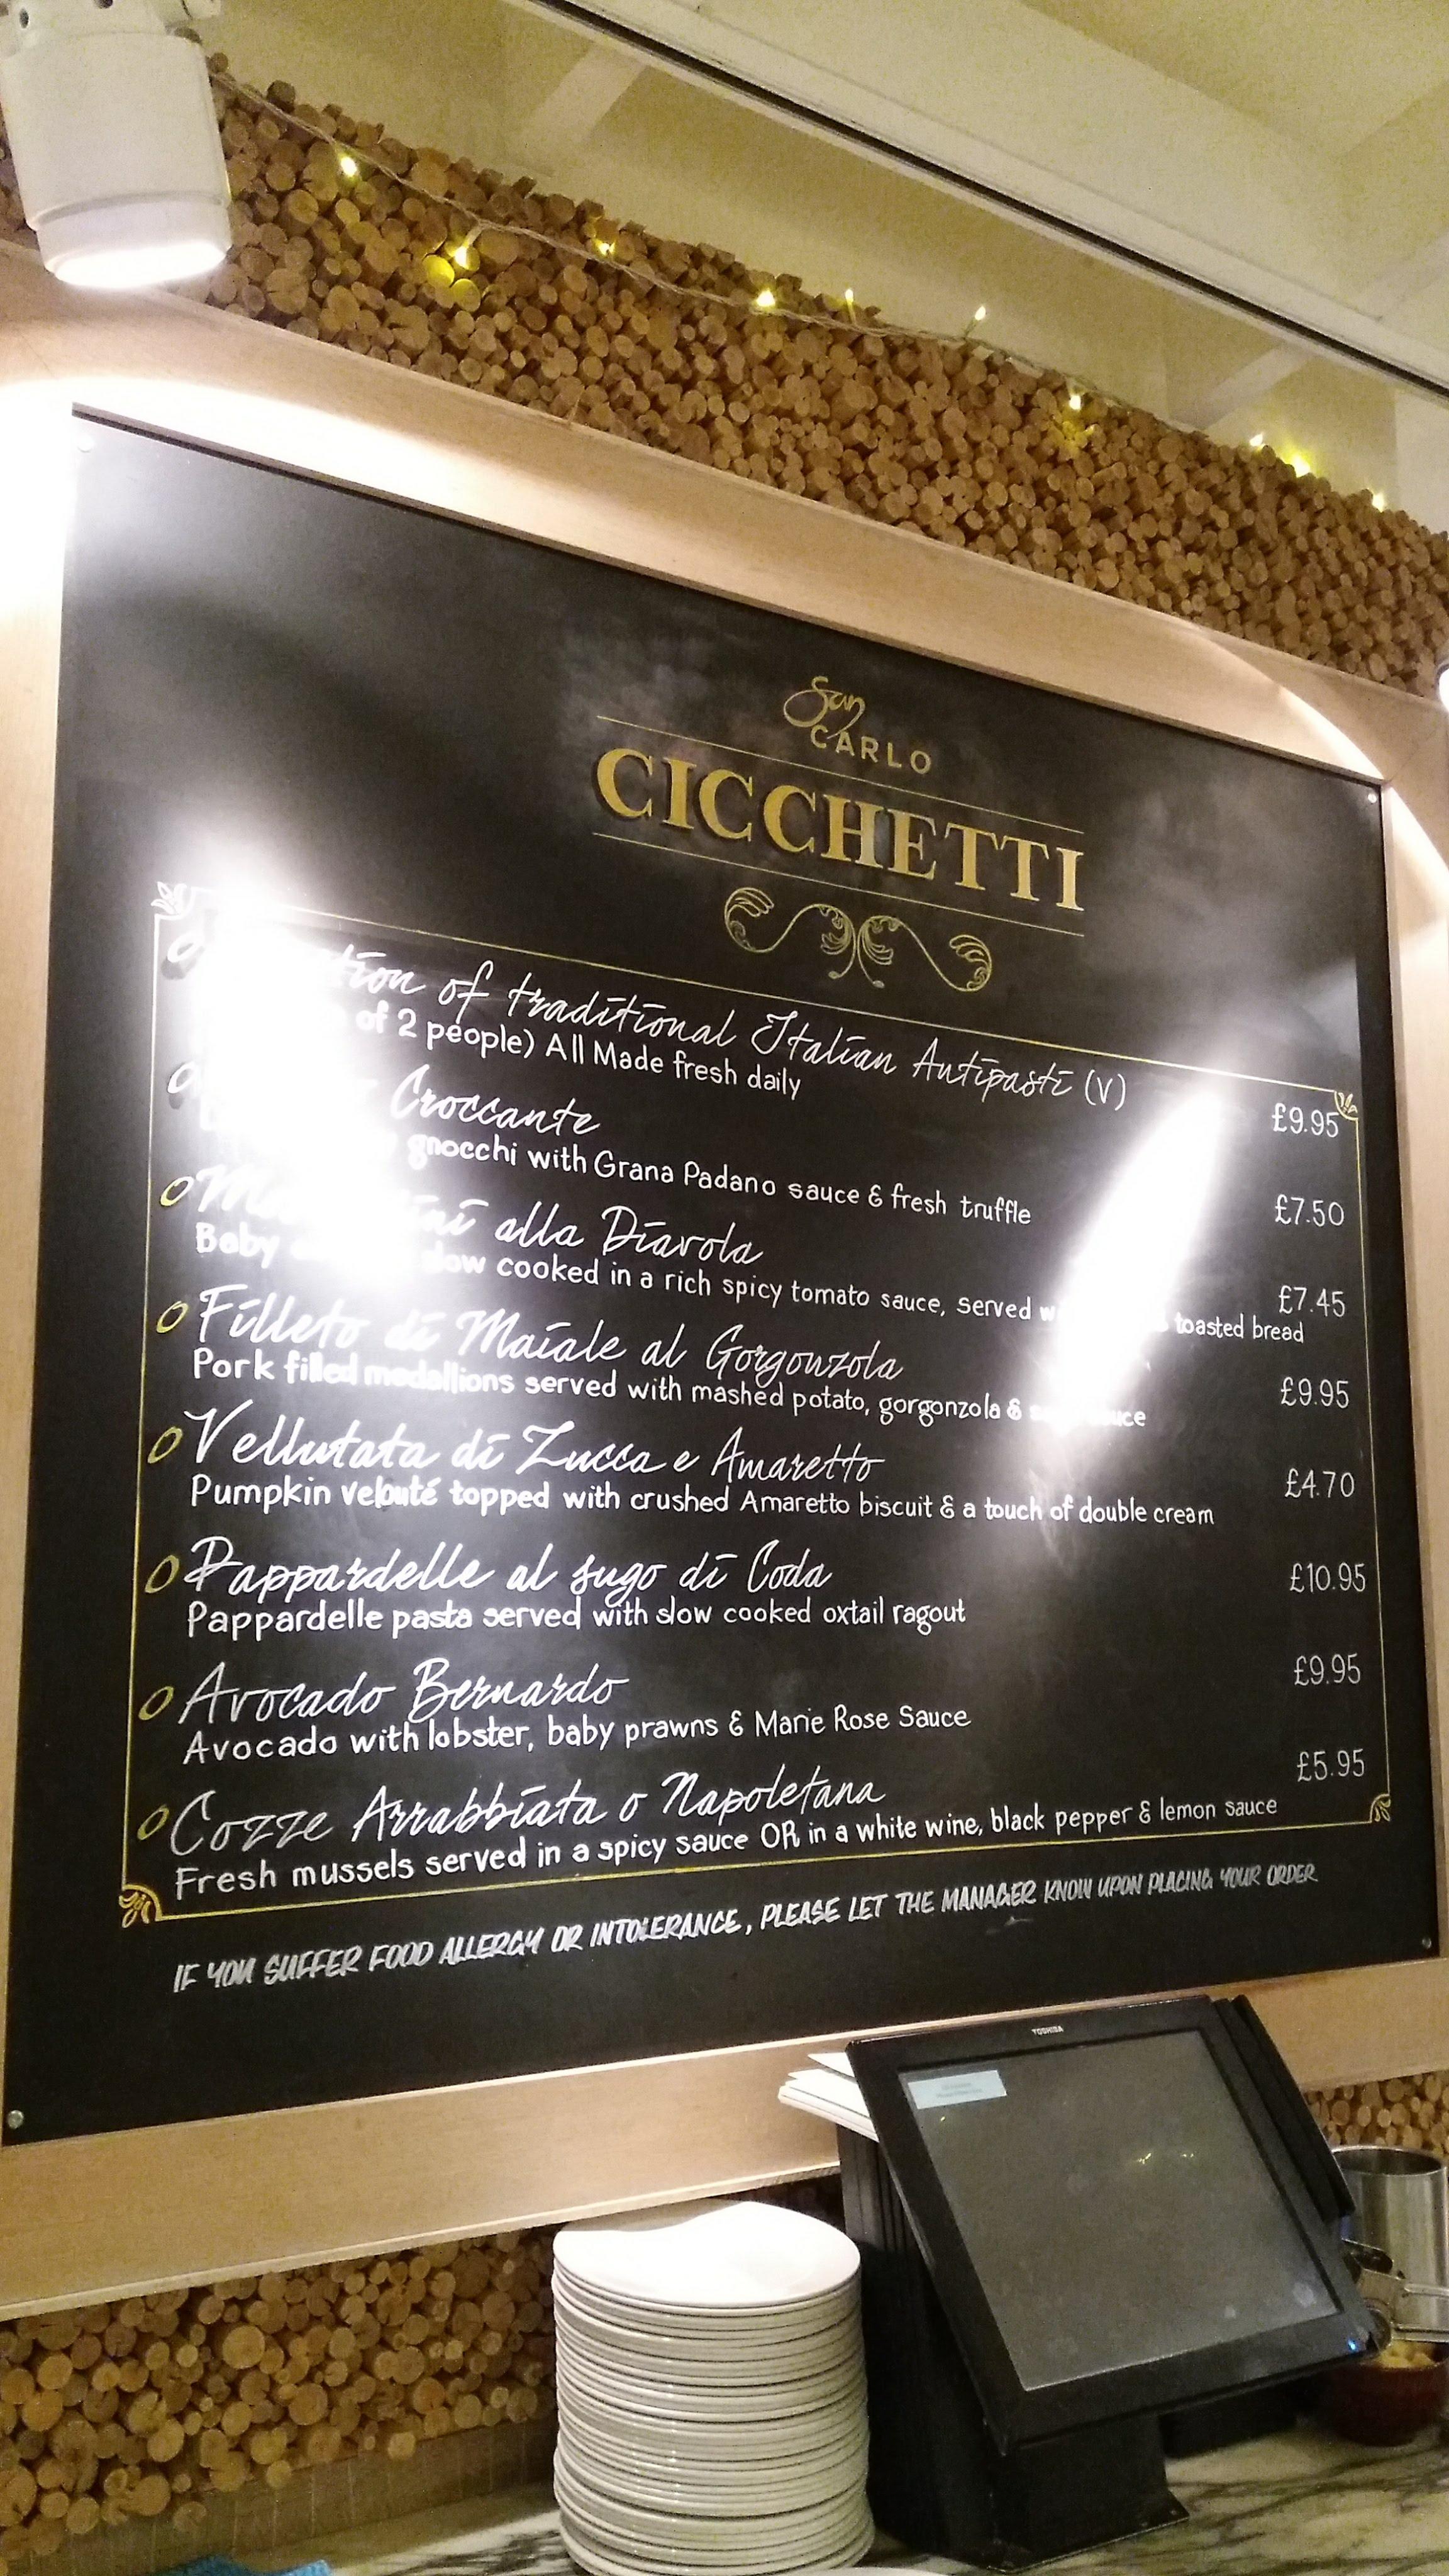 San Carlo Cicchetti , Manchester